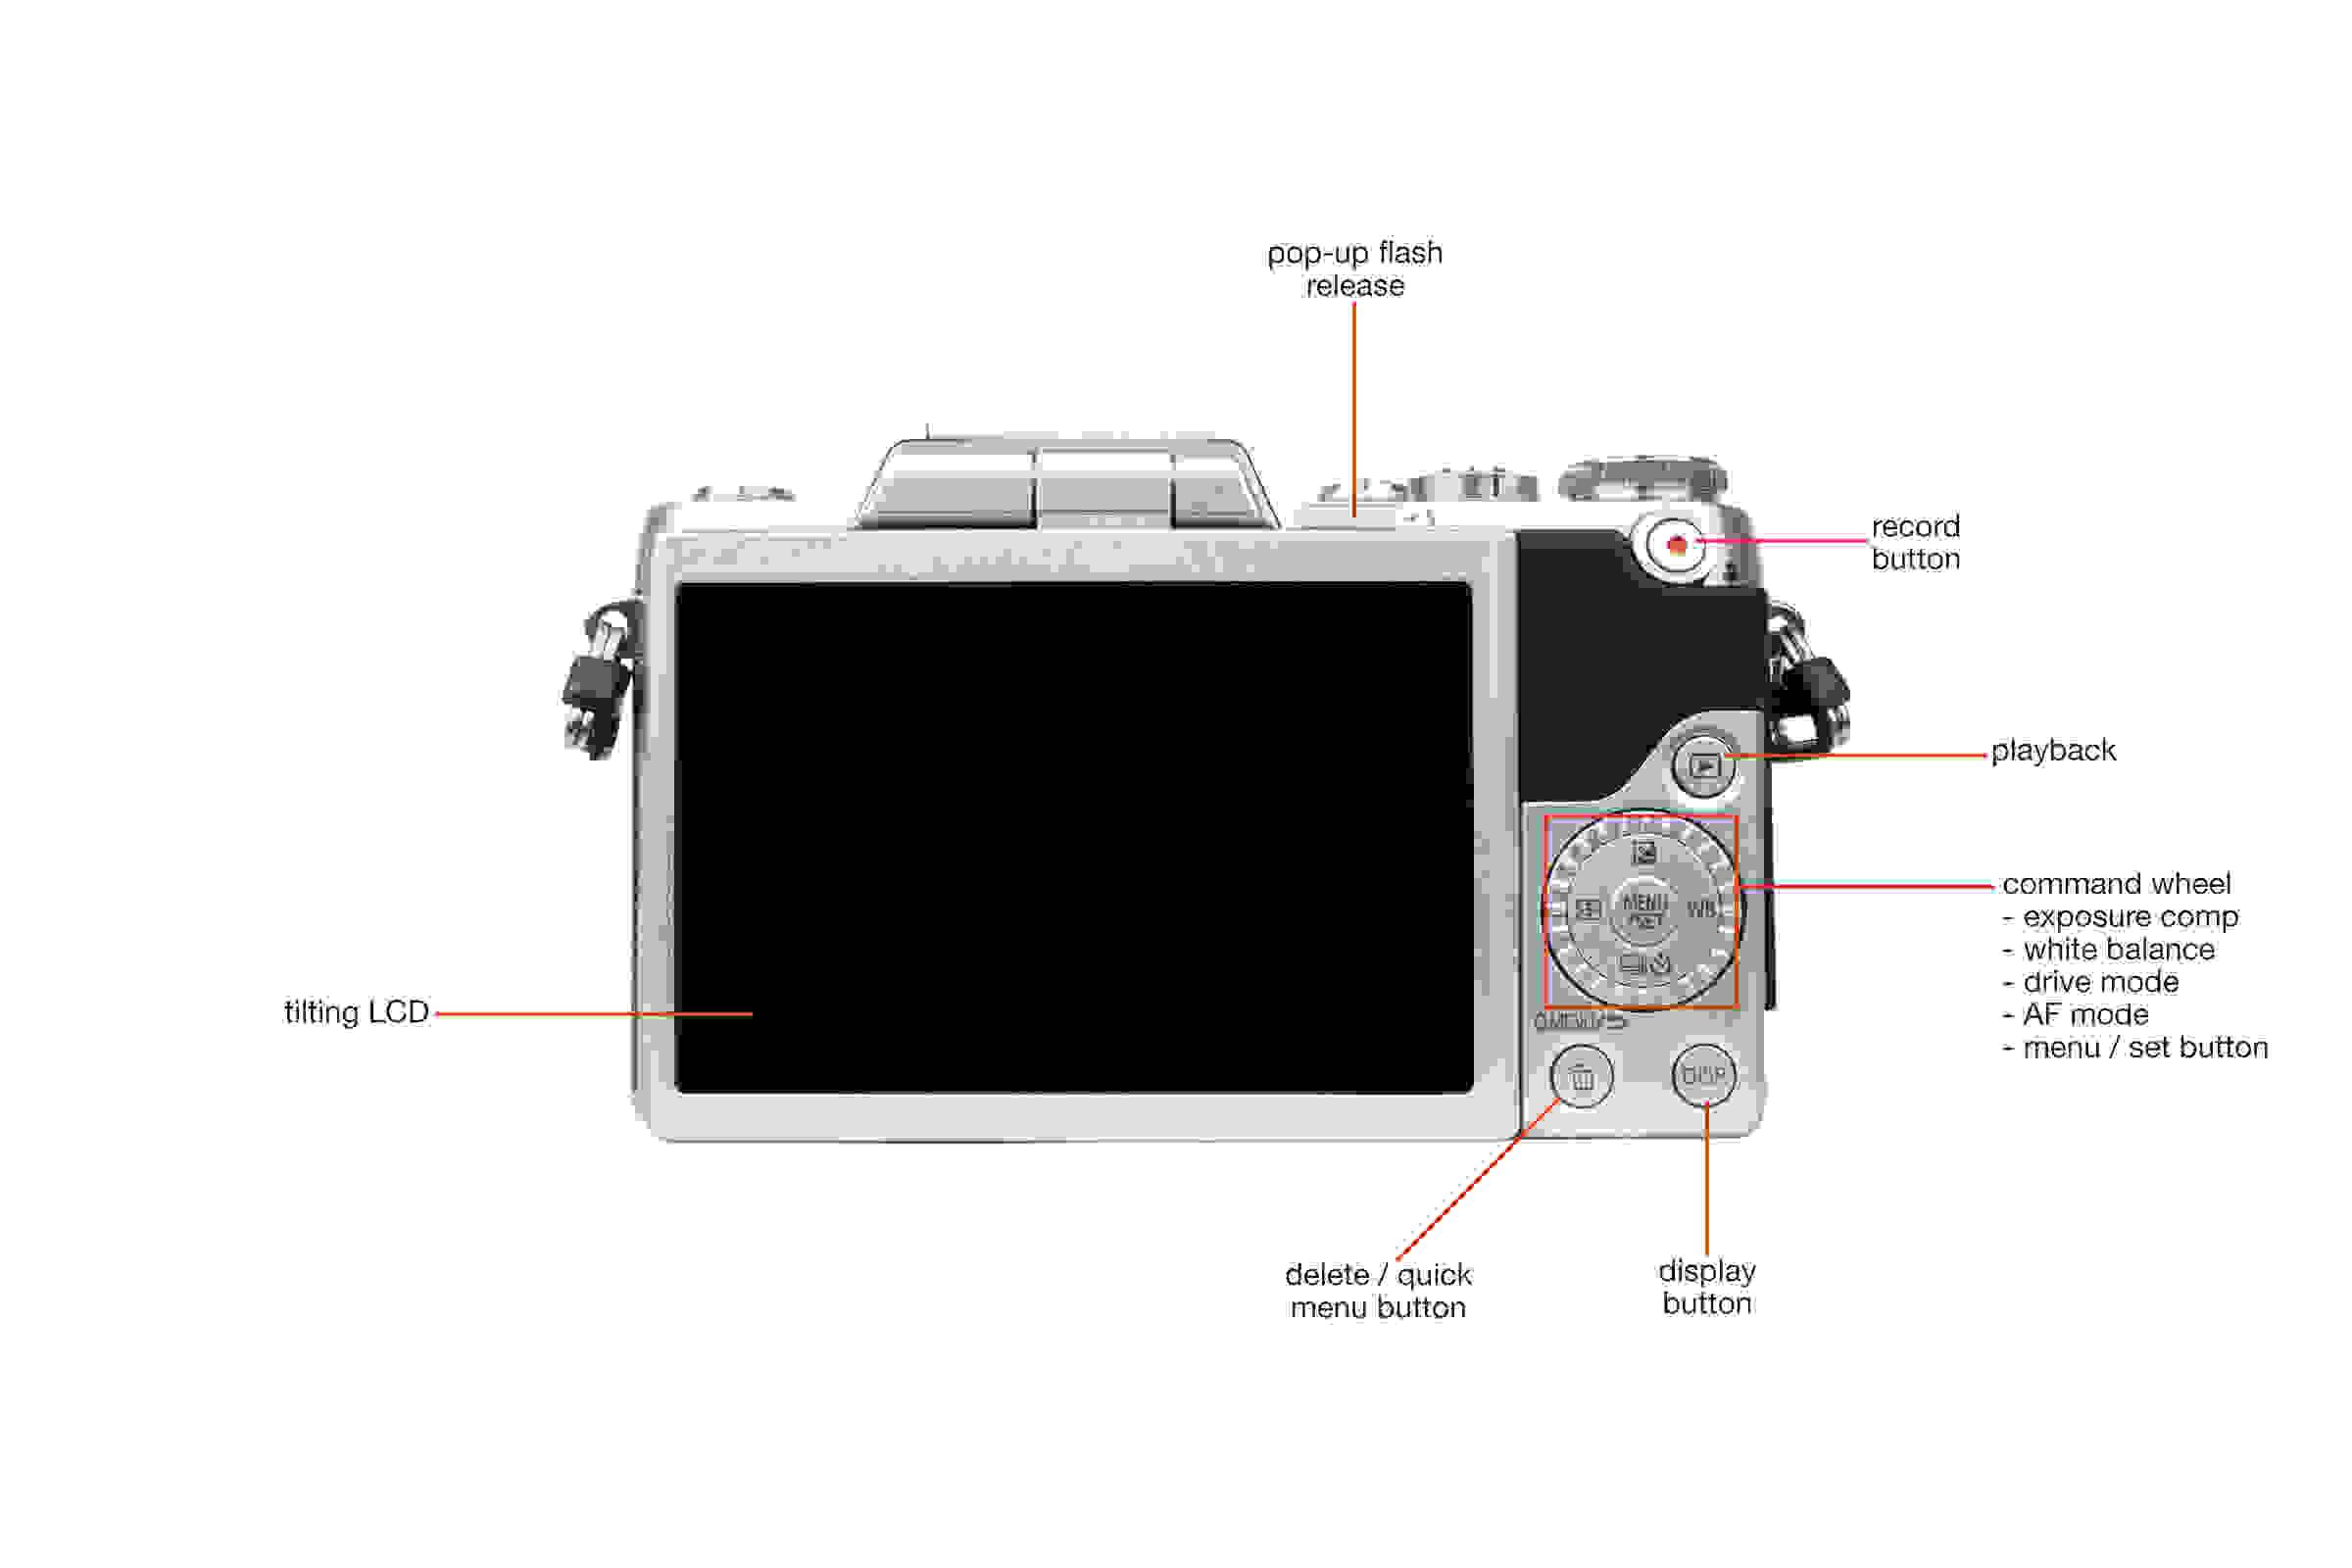 Rear view of the Panasonic Lumix DMC GF7 .